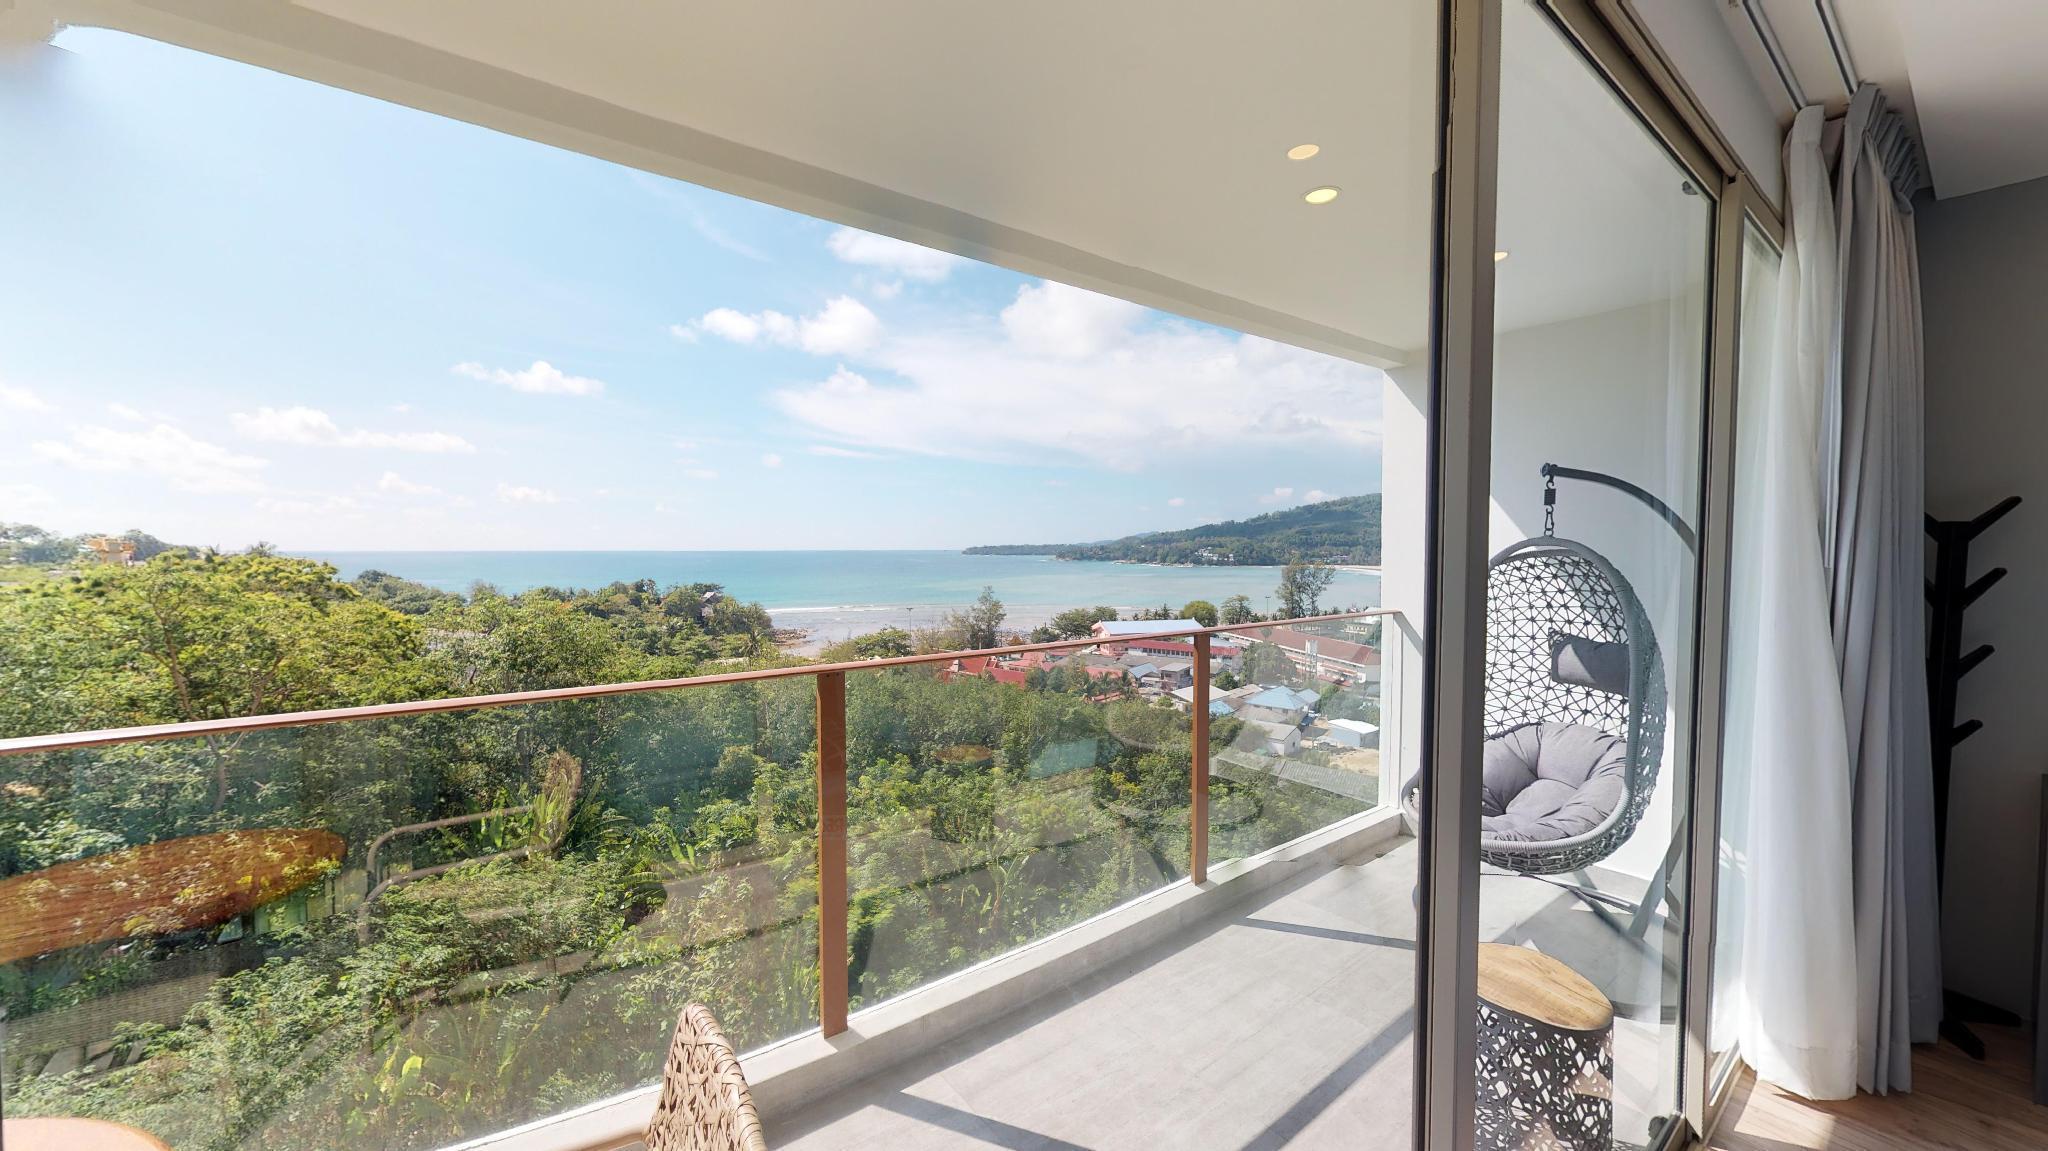 2 Bed SEA VIEW Apartment Close to beach - B66 อพาร์ตเมนต์ 2 ห้องนอน 2 ห้องน้ำส่วนตัว ขนาด 76 ตร.ม. – กมลา